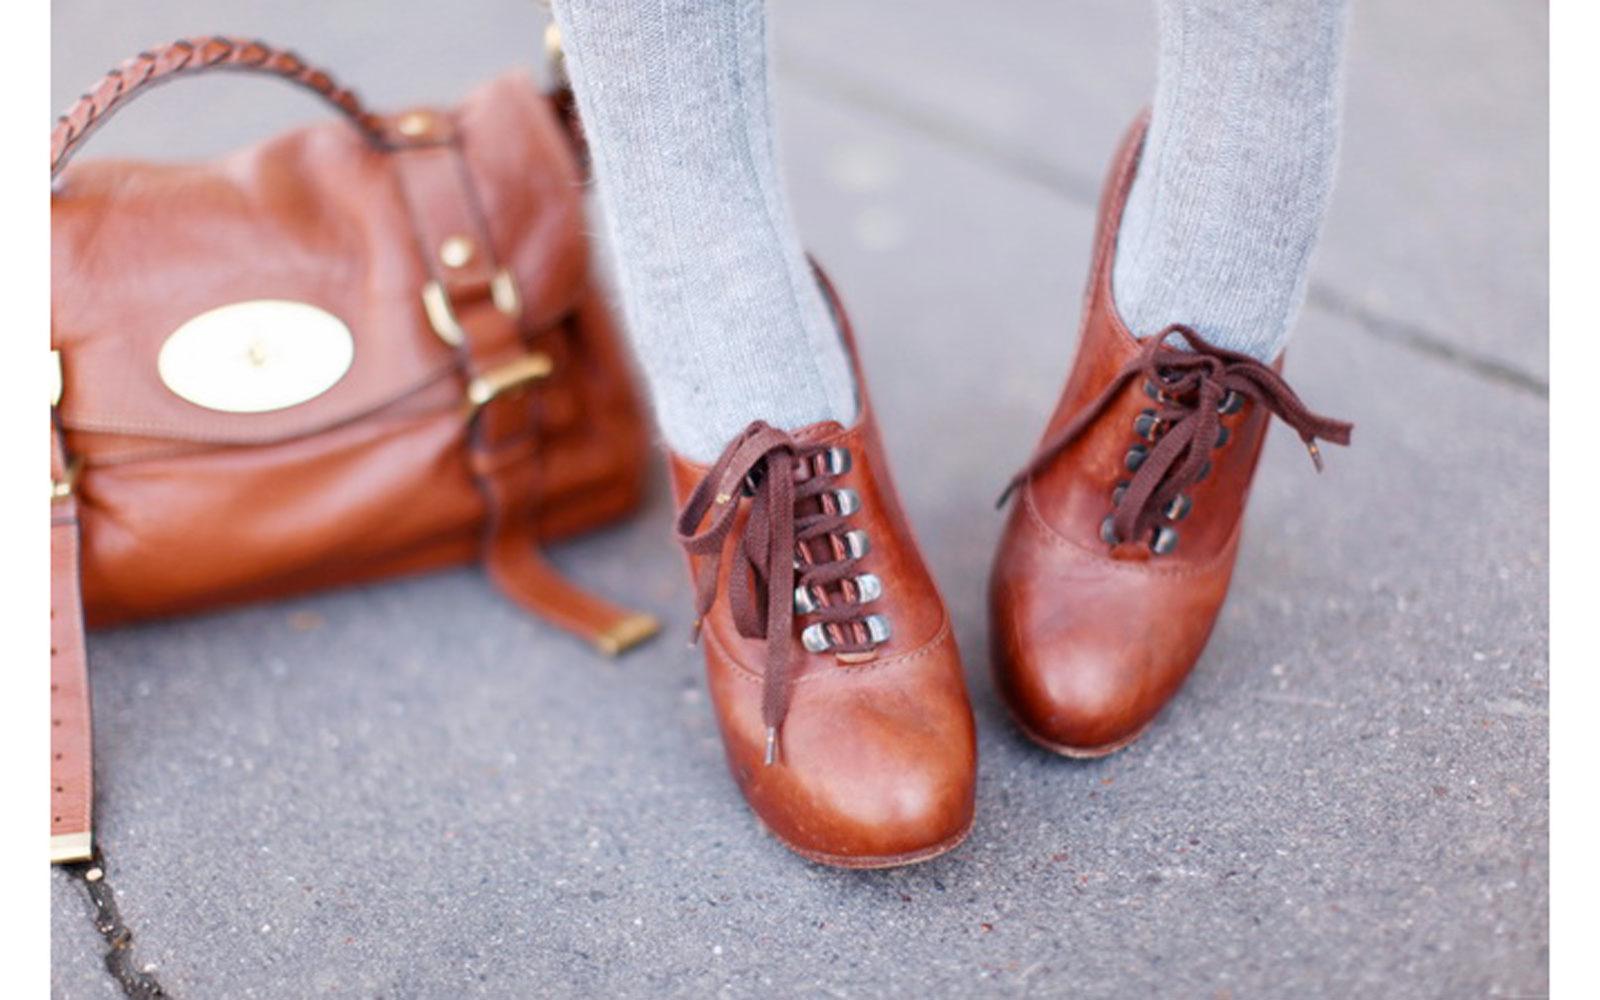 Postina Mulberry, francesine in cuoio Chloé, socks Asos